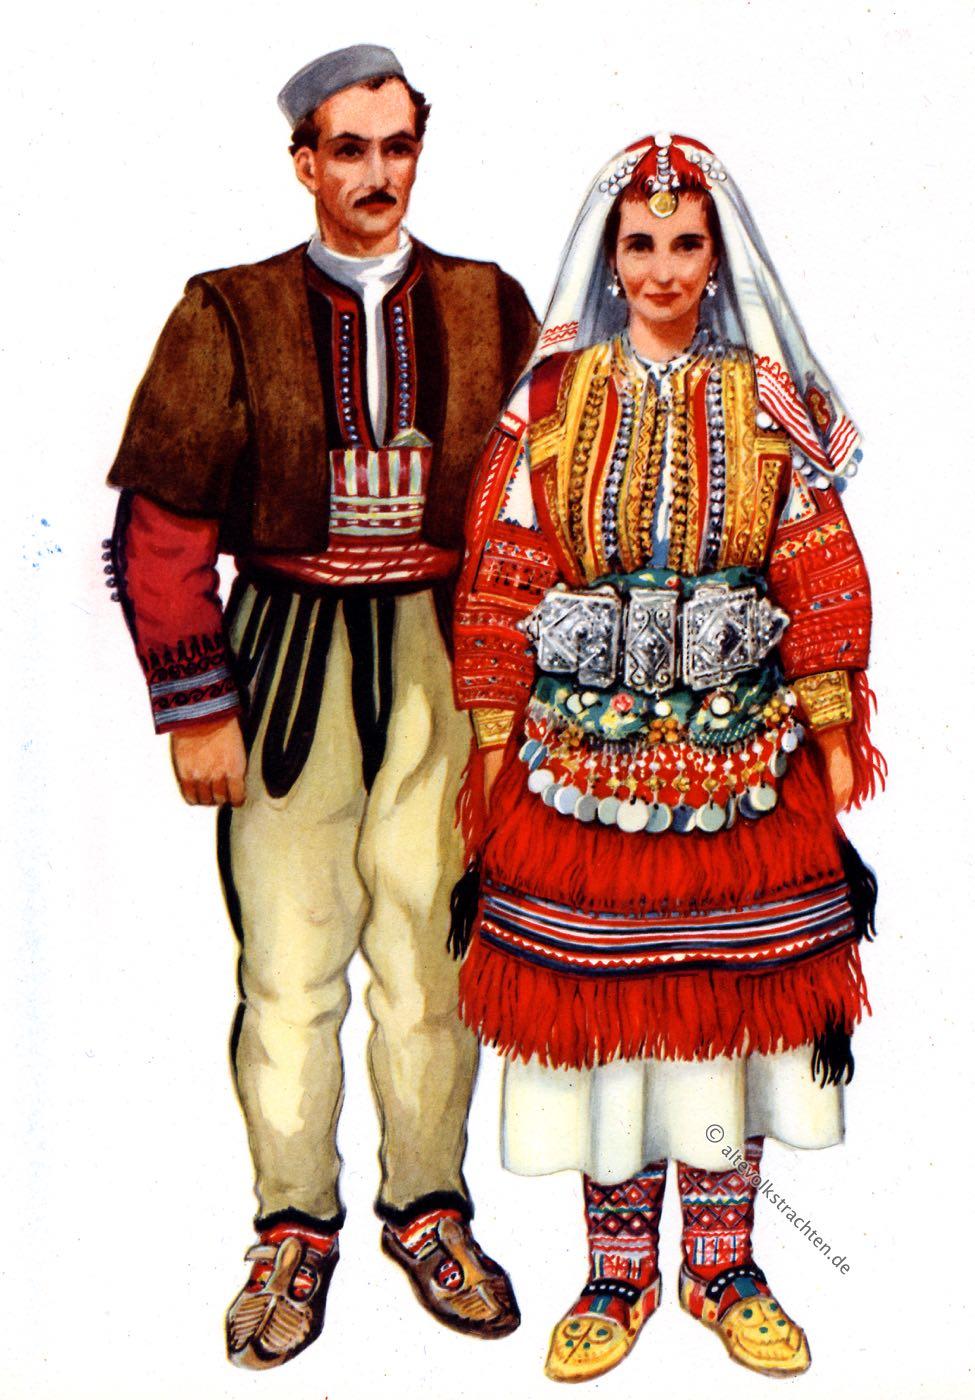 Mijaks, Mazedonier, Galičnik, Mazedonien, Trachten, Kleidung, Kostüme, Vladimir Kirin, Srpske, nacionalne, kostime